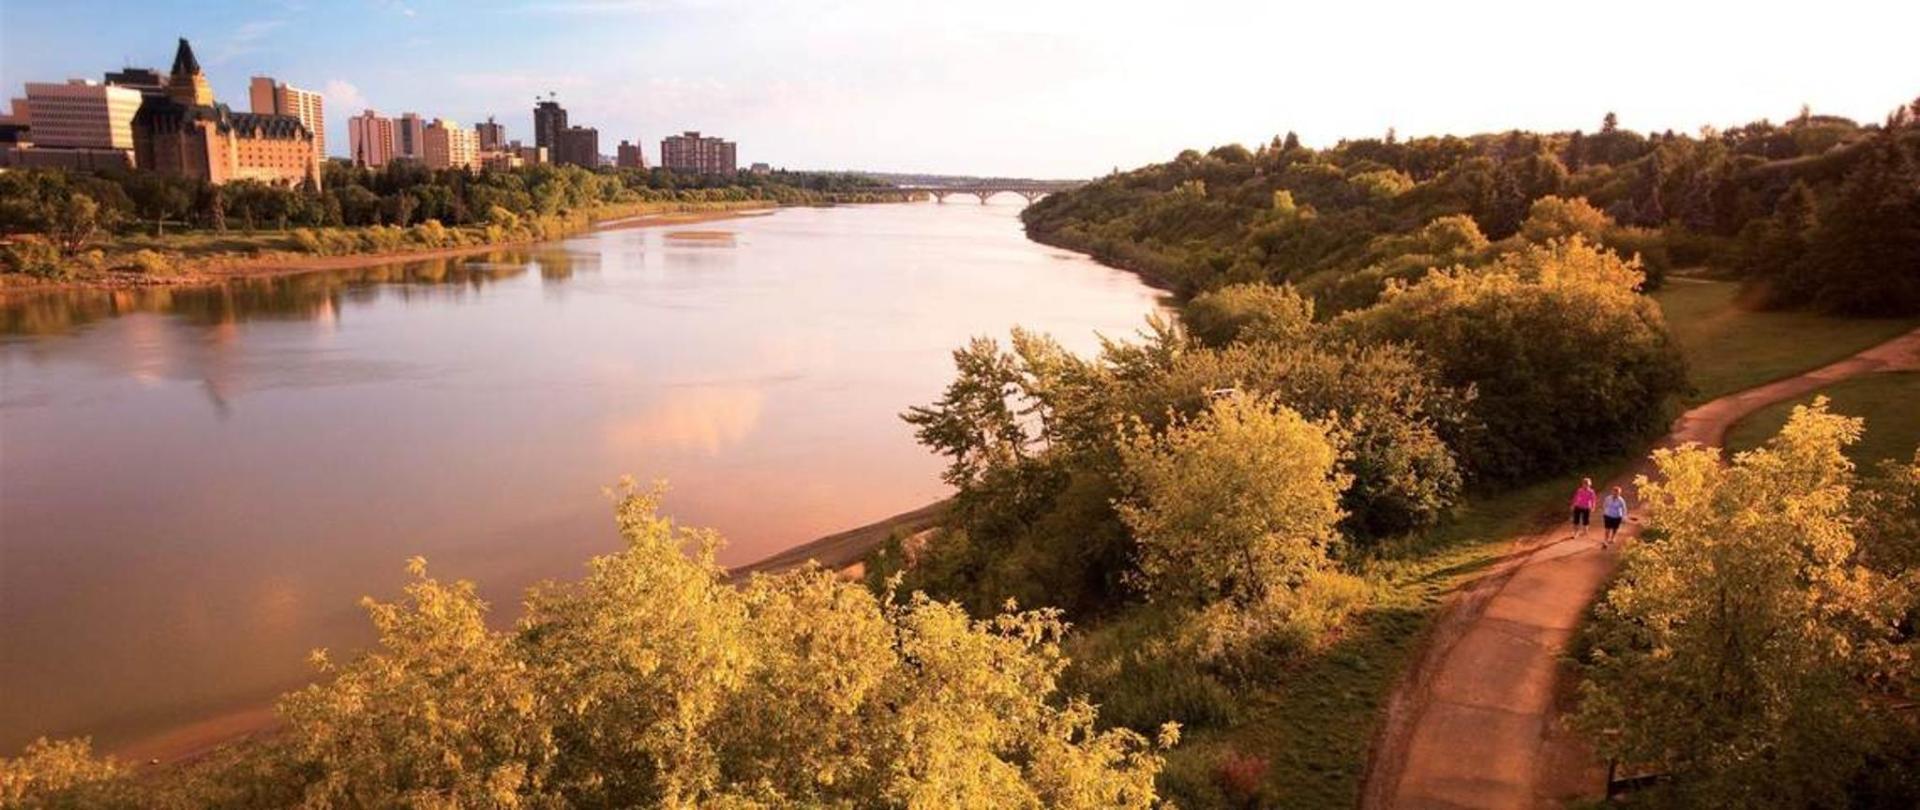 meewasin-valley-trails-along-the-south-saskatchewan-river-compliments-of-tourism-saskatoon.jpg.1140x481_default.jpg